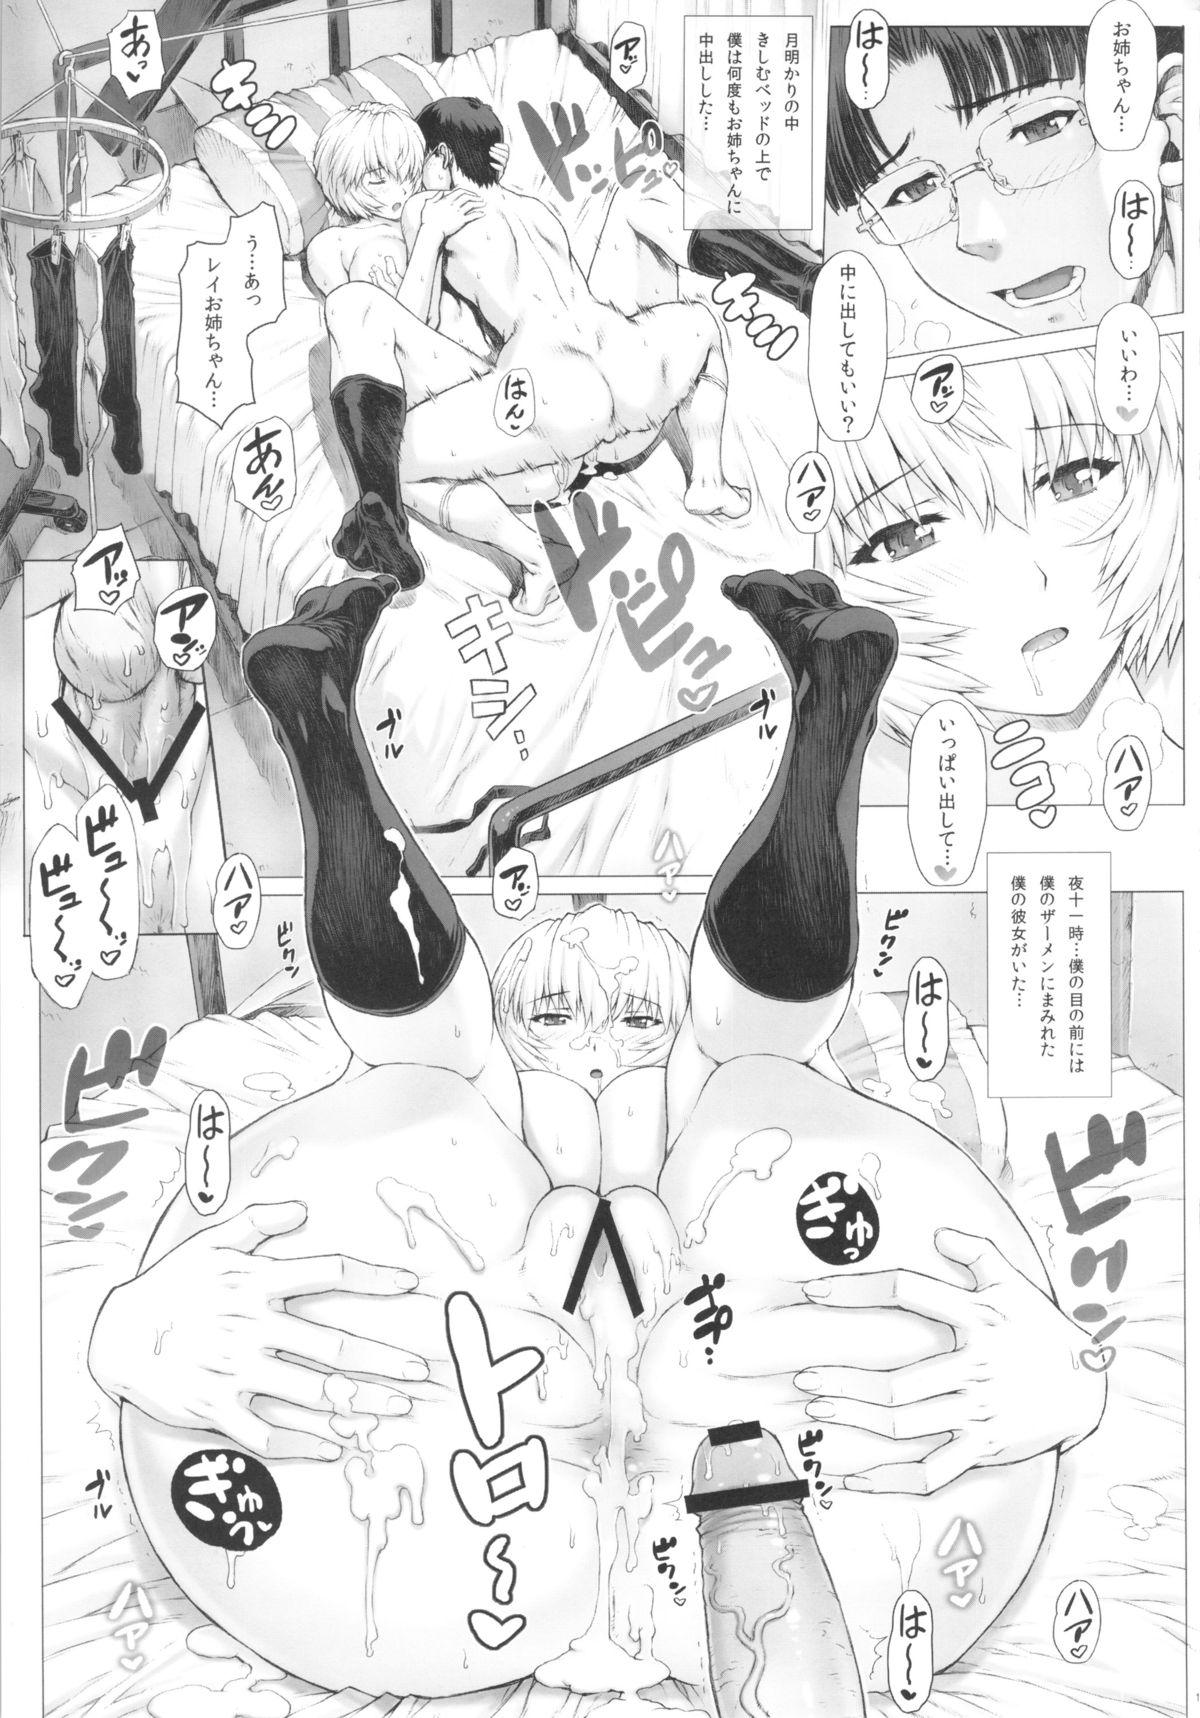 Ayanami Dai 4 Kai + Omake Bon + Postcard 12